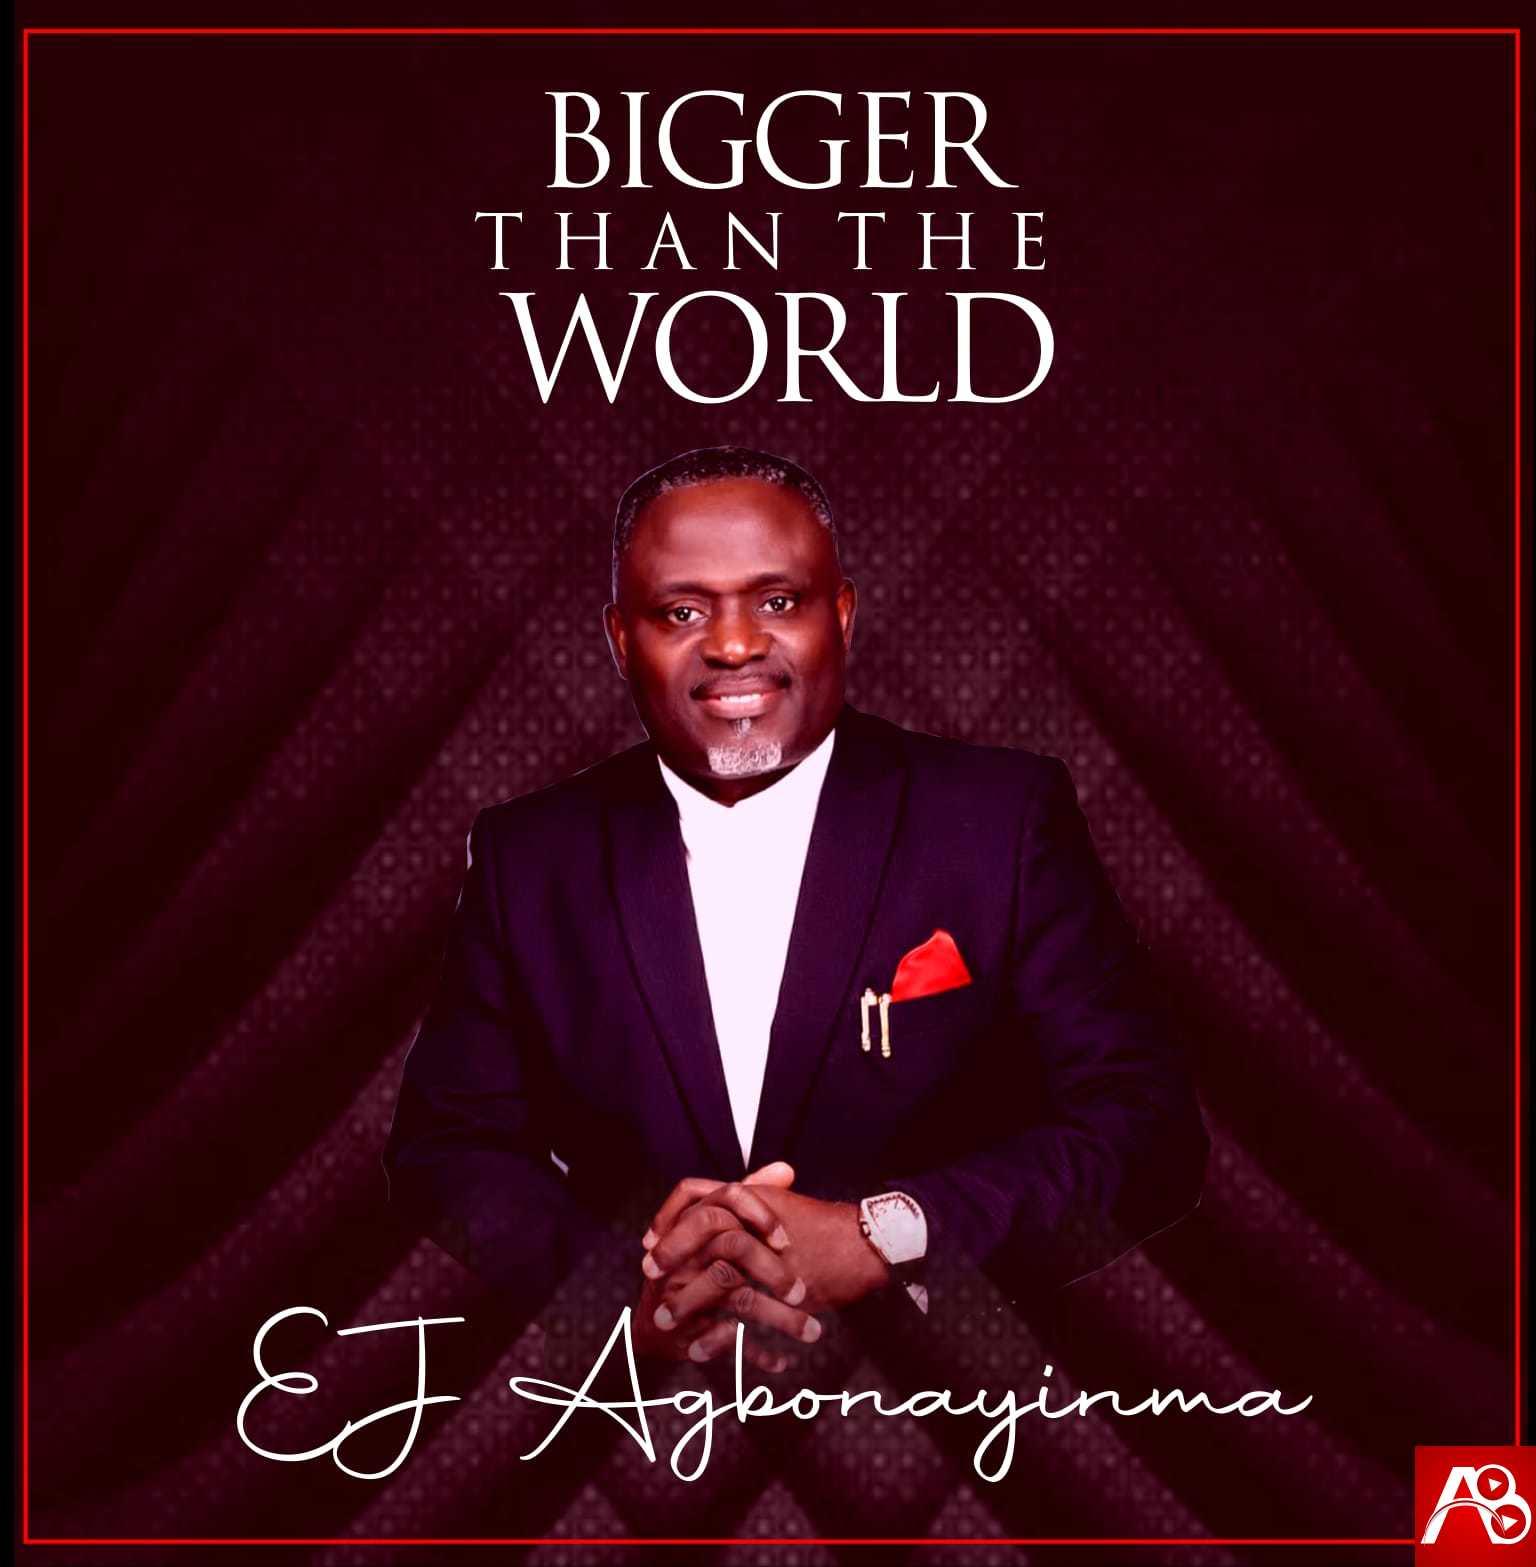 EJ Agbonayinma - Bigger Than The World